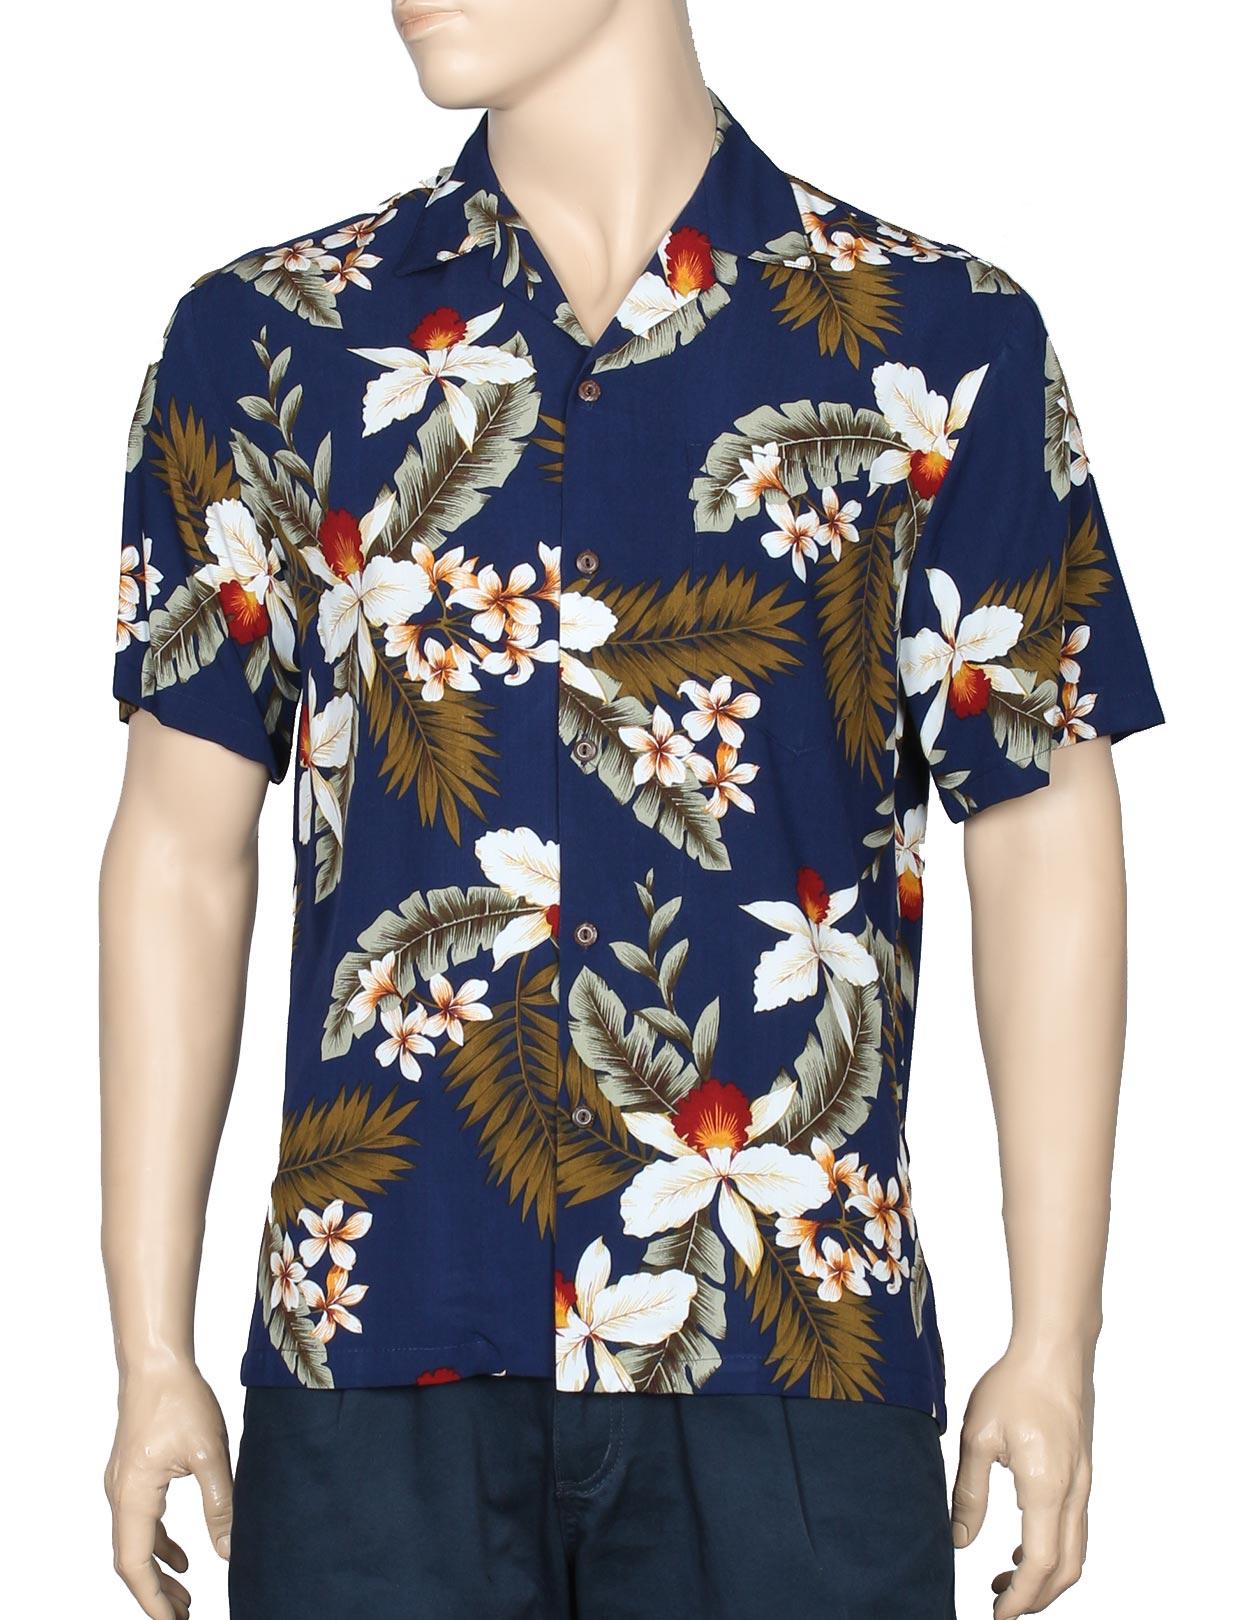 64fbfa74fa226 Hanapepe Rayon Hawaii Cocktail Shirt  Shaka Time Hawaii Clothing Store